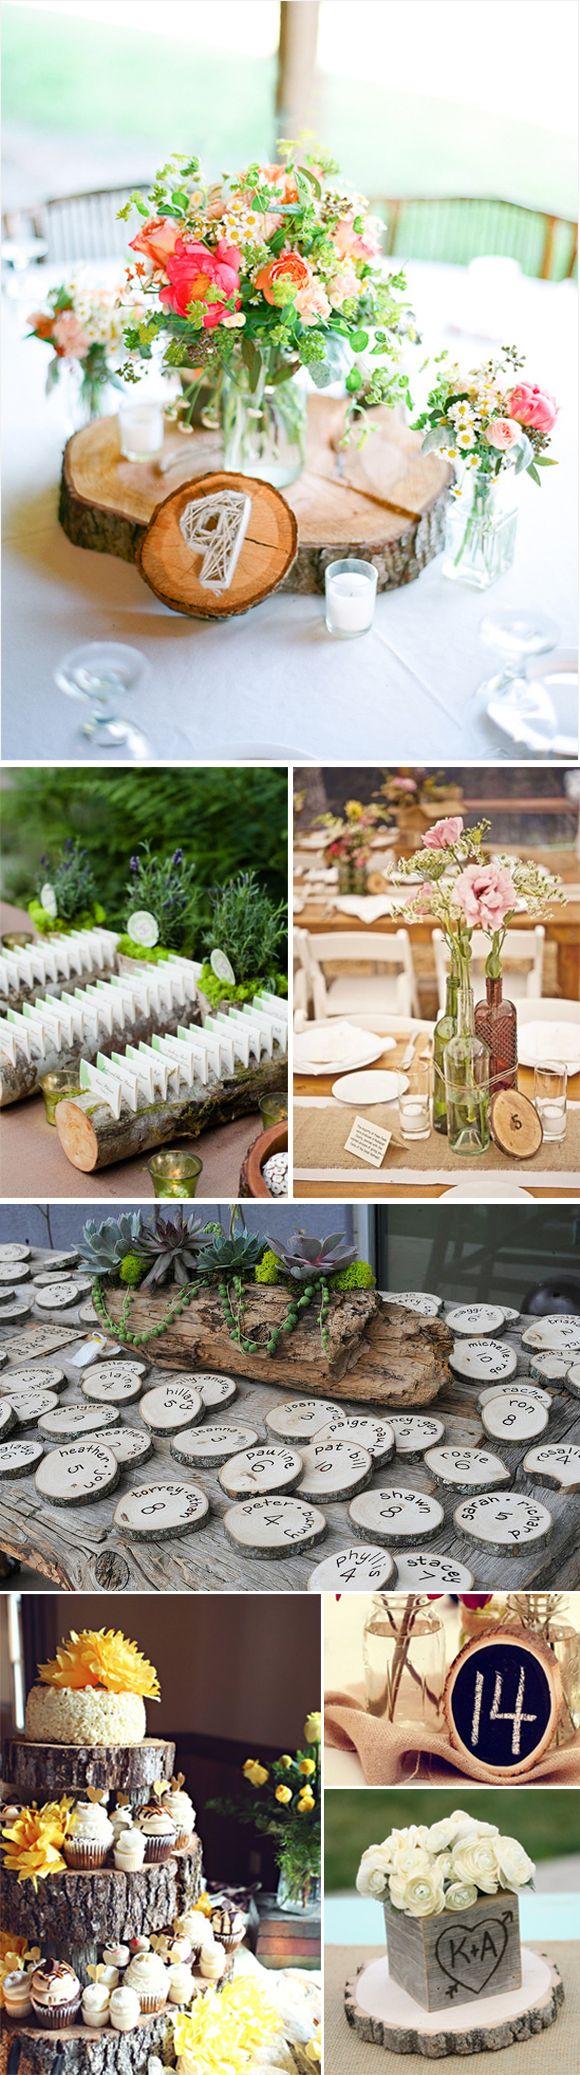 Decoracion de boda con troncos de madera. Ideas para tu boda